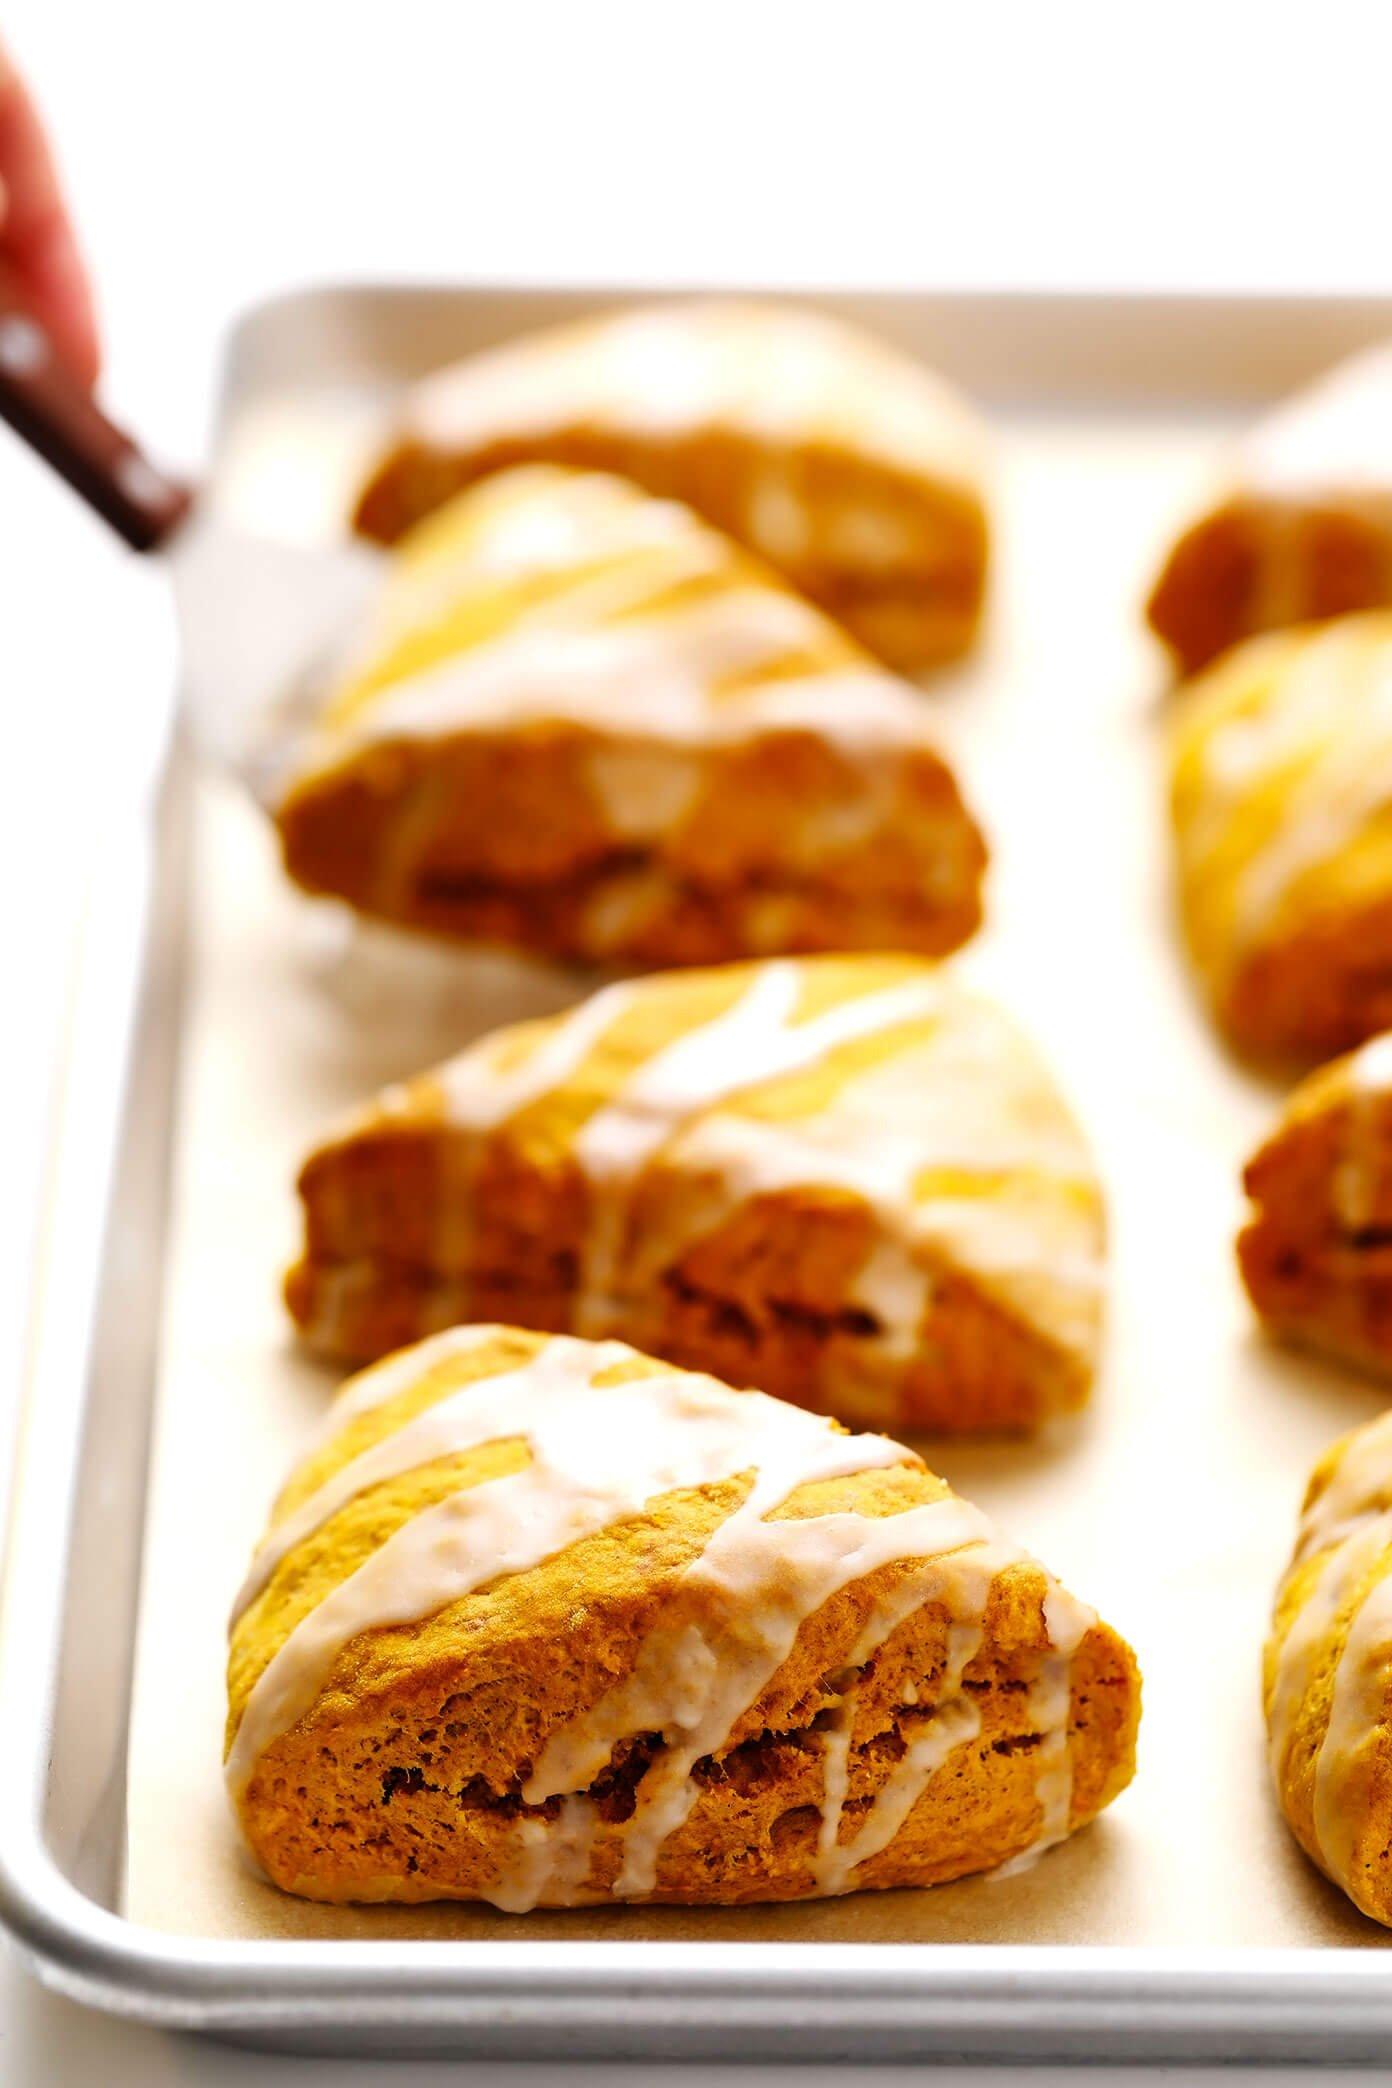 Pumpkin Scones with Vanilla Glaze on Baking Sheet